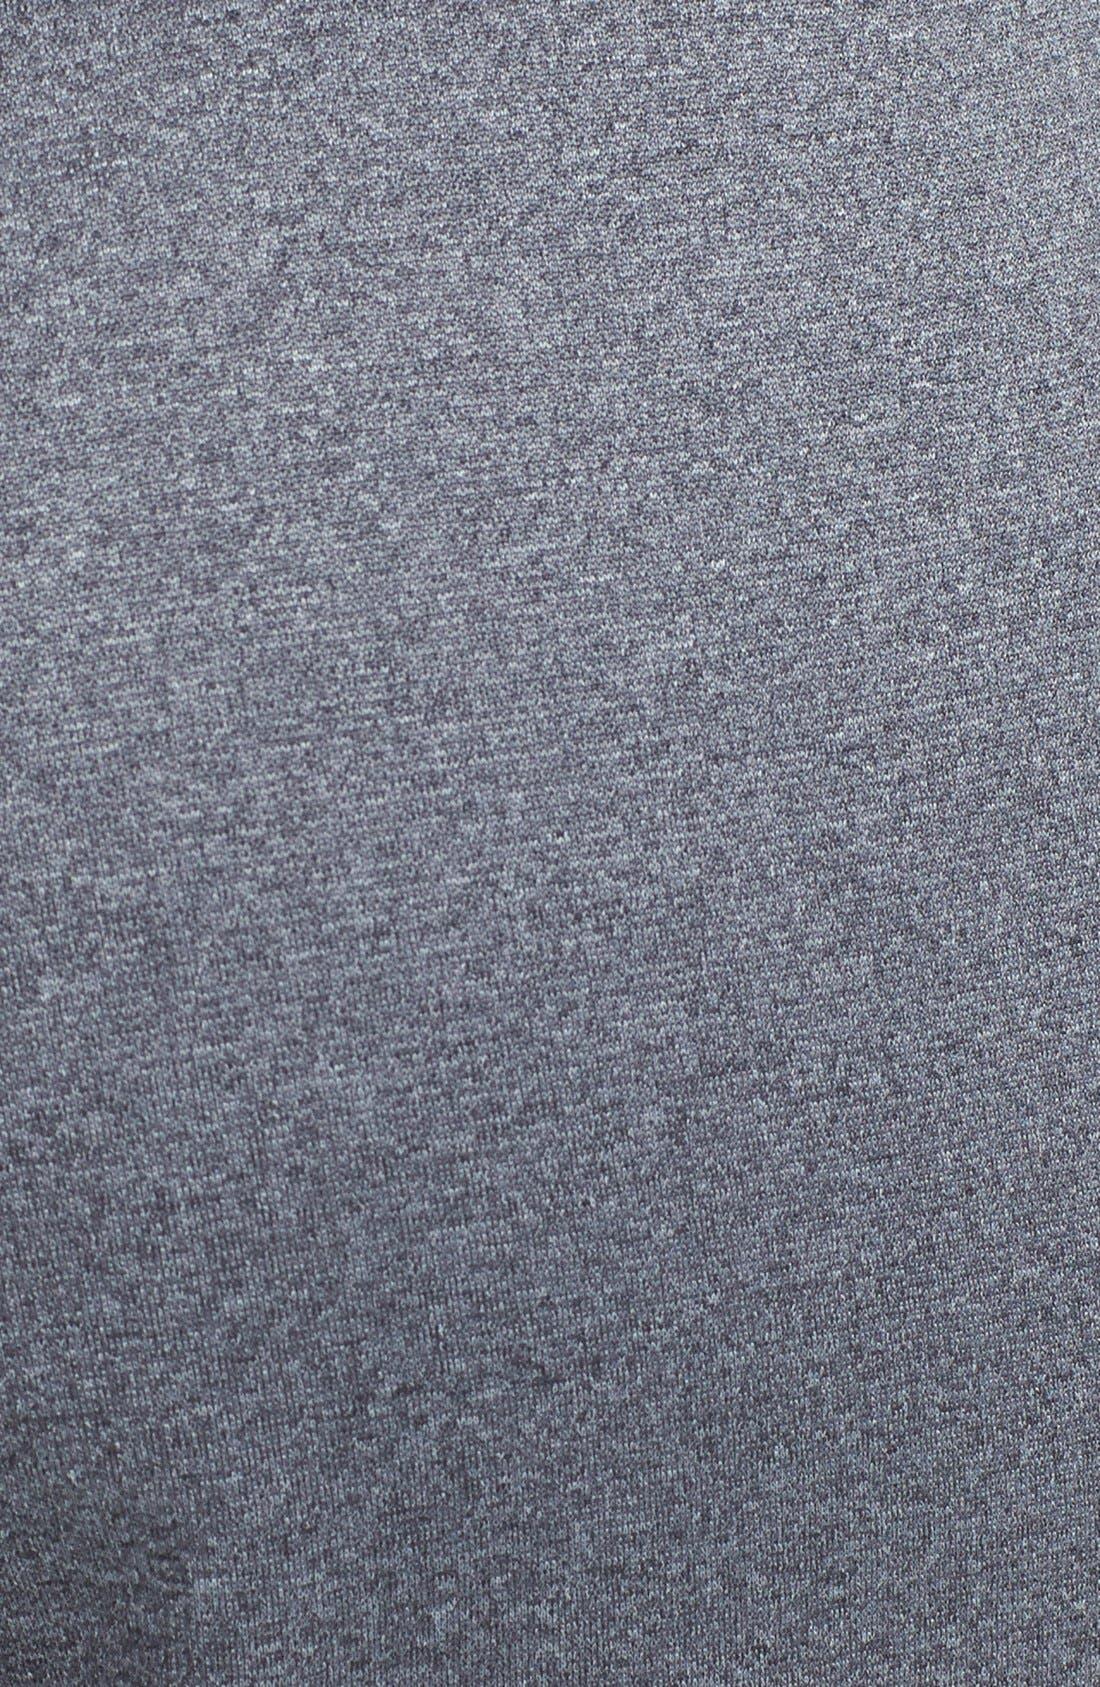 Alternate Image 3  - Under Armour 'Storm' Fleece Pants